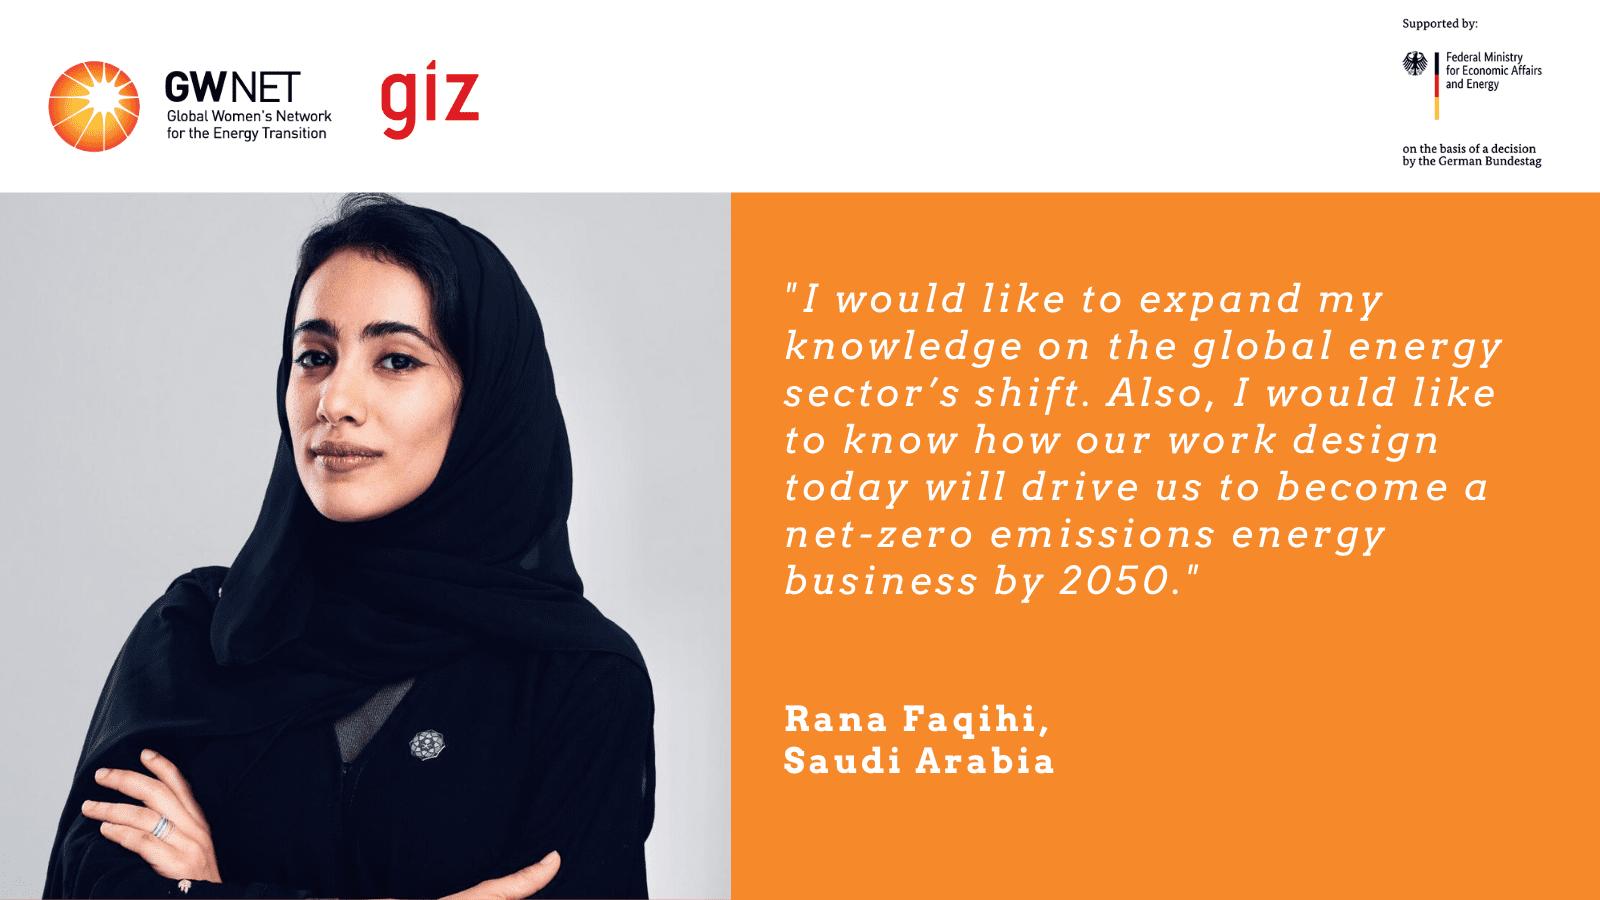 Rana Faqihi quote